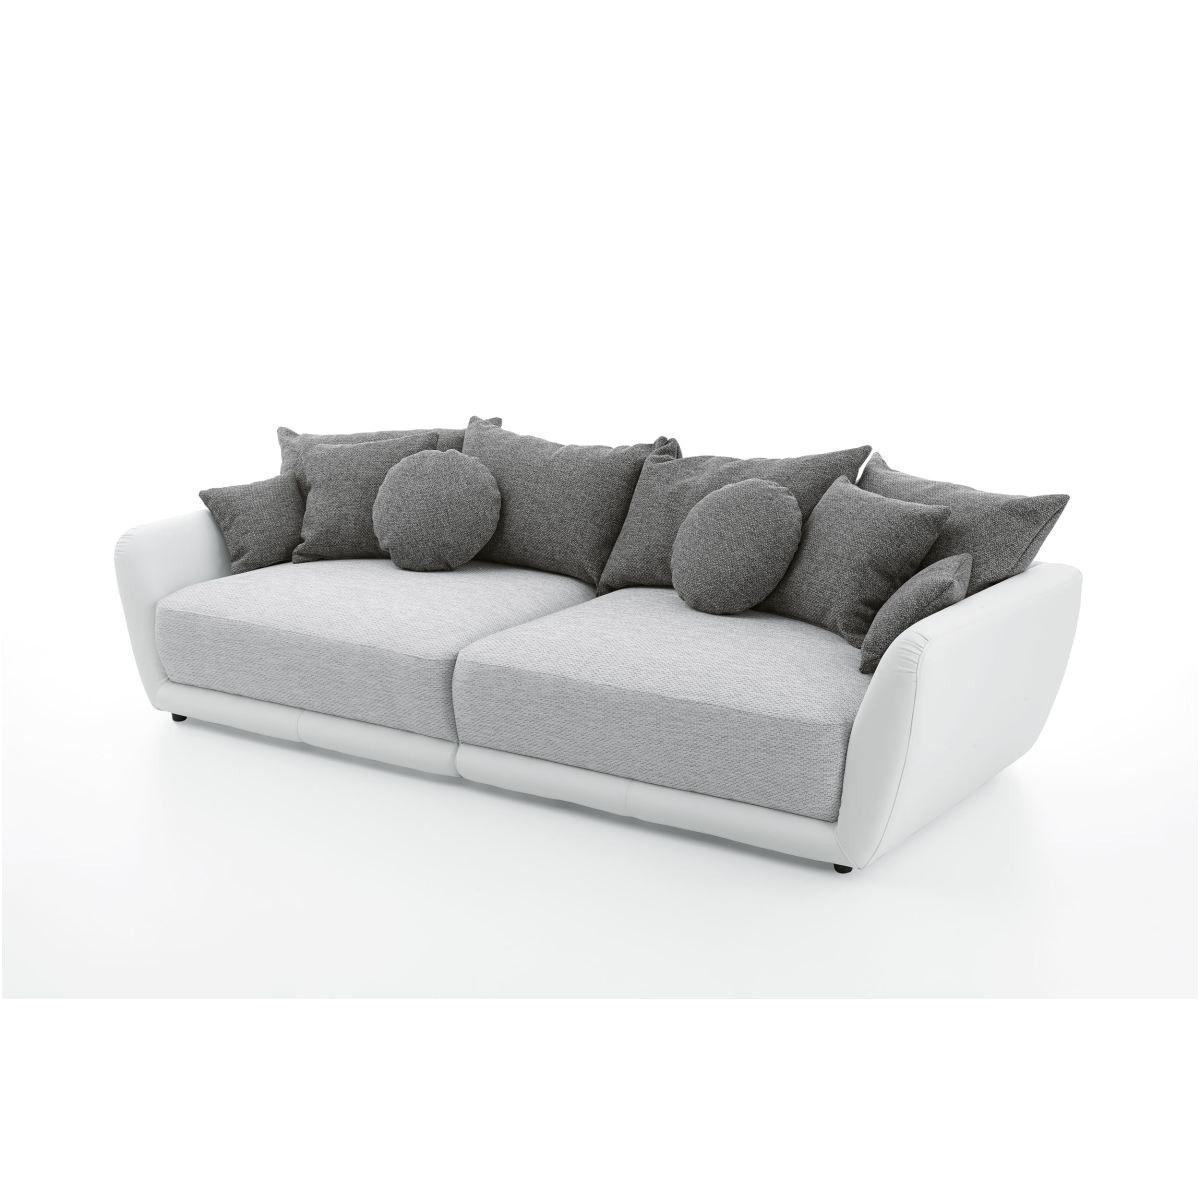 Authentisch Sofa Mobel Boss In 2020 Home Decor Decor Sofa